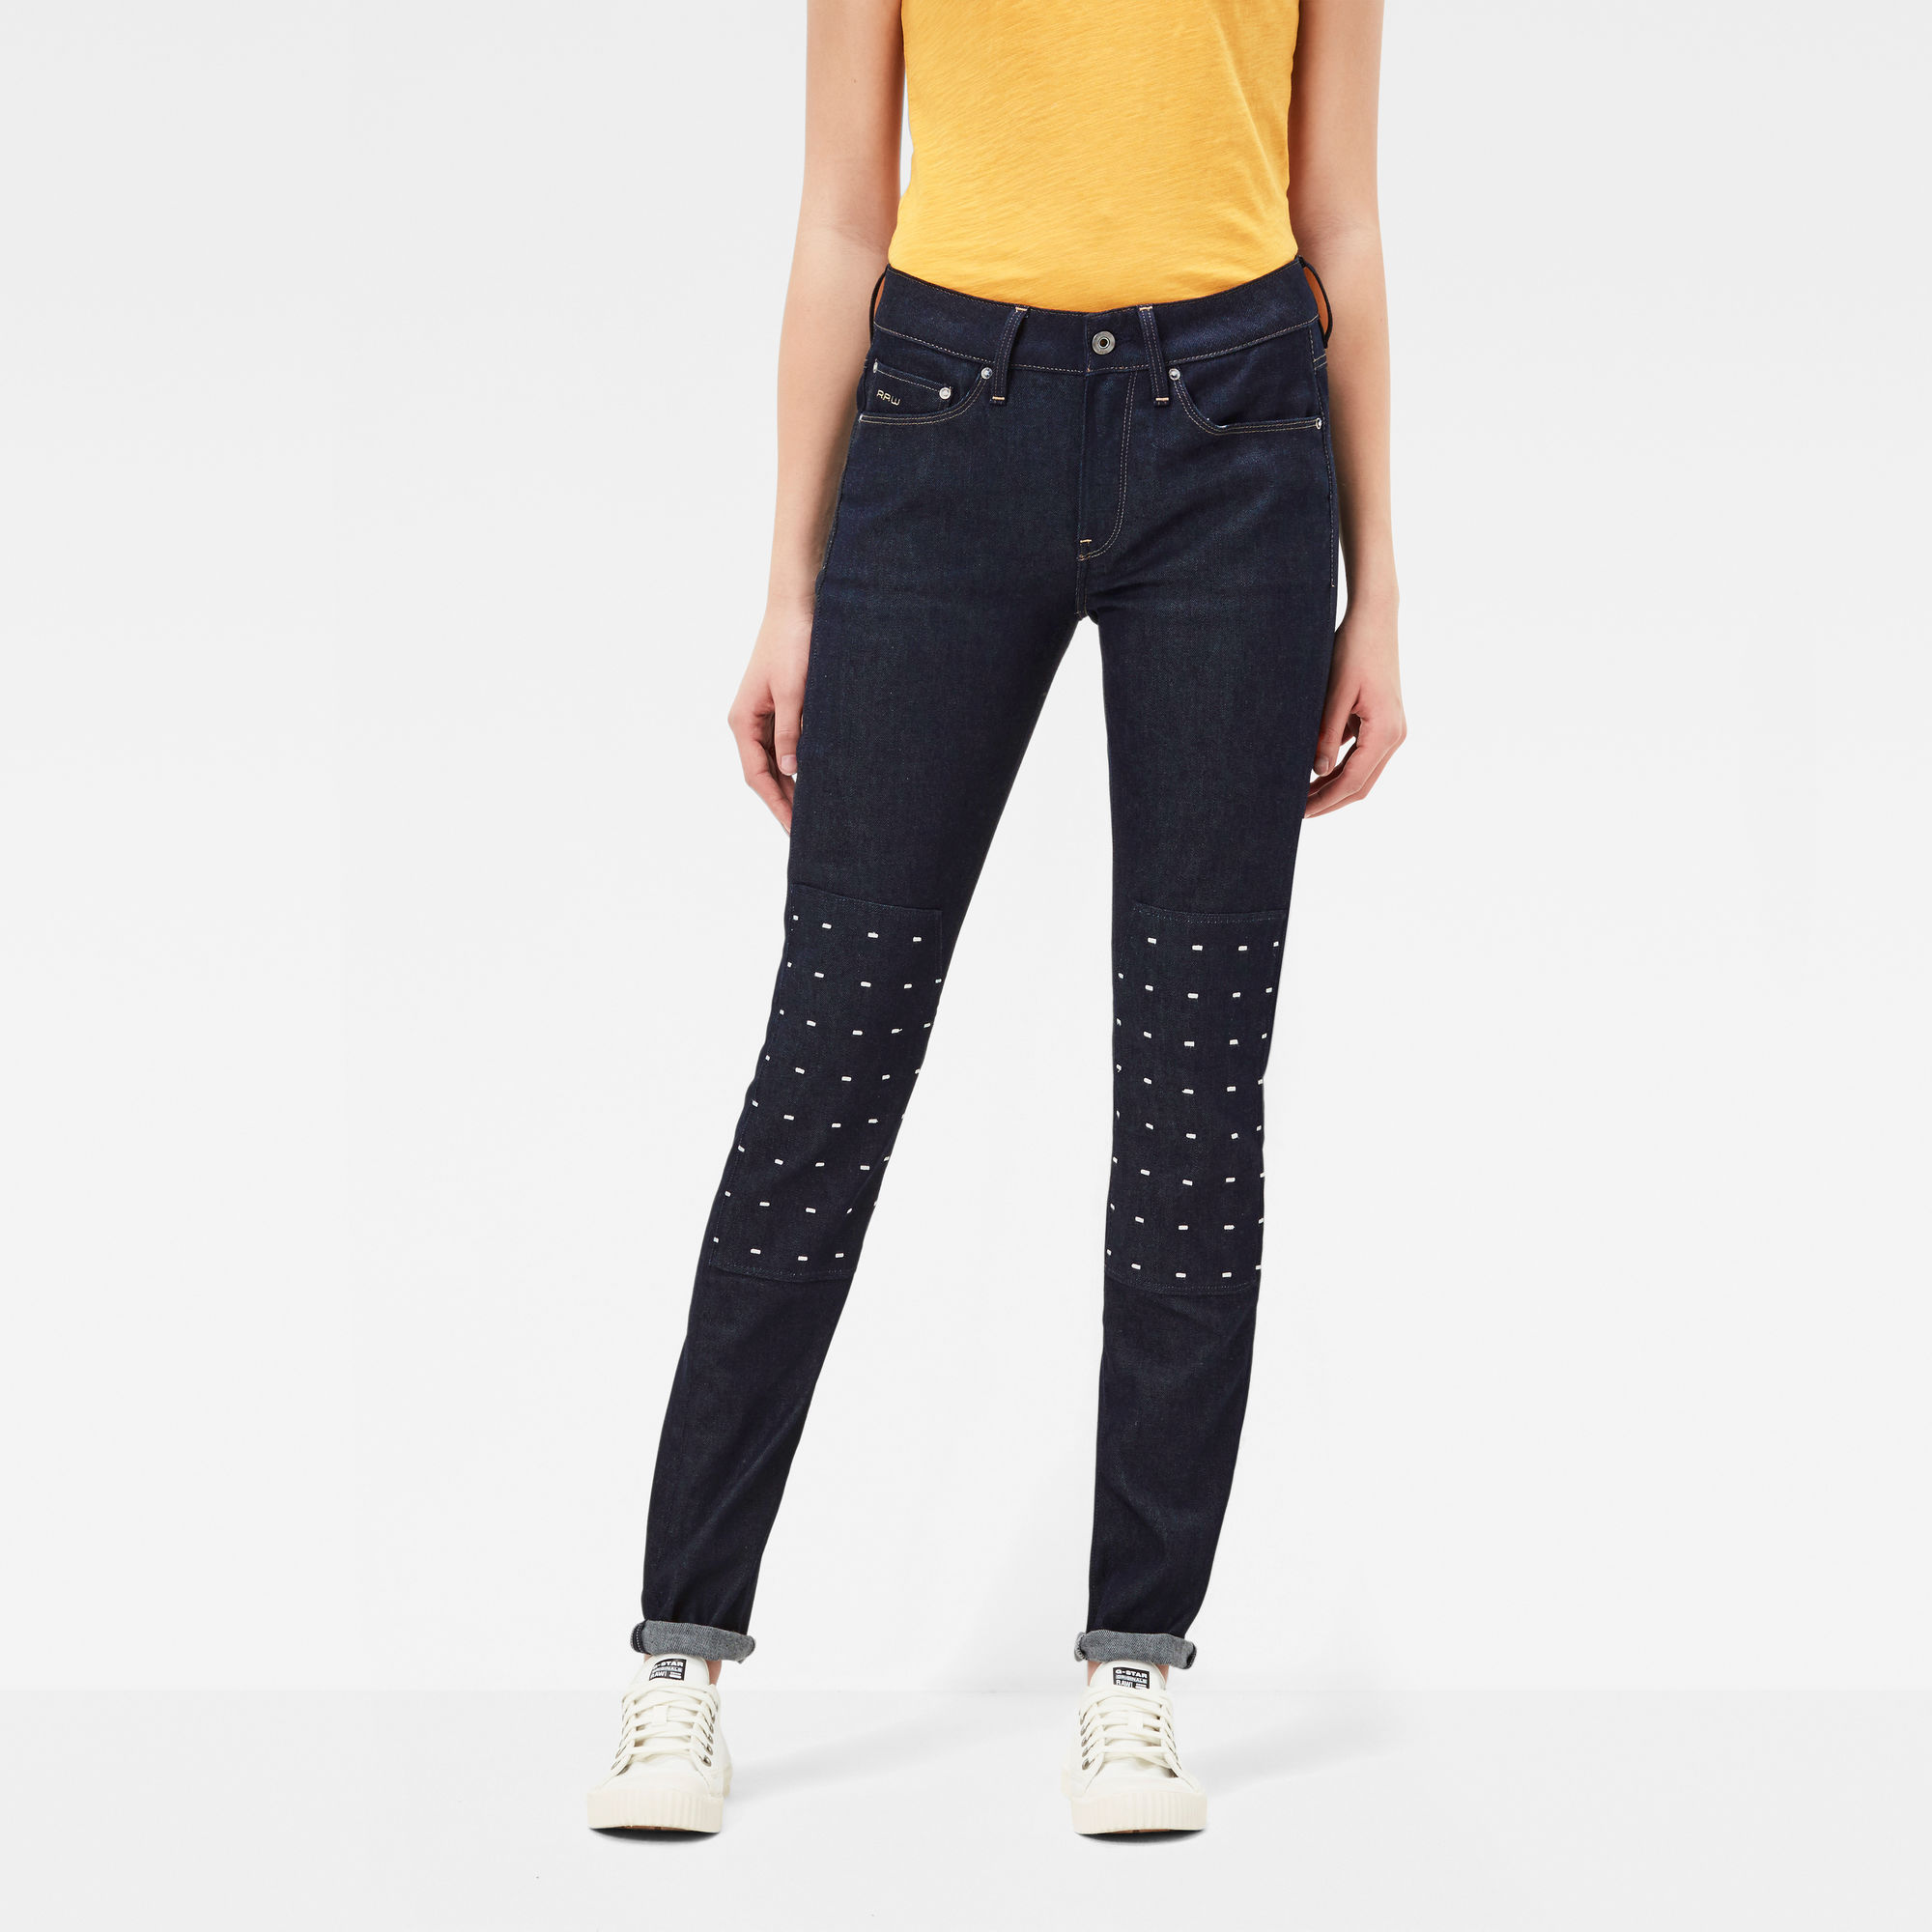 3301 MS High Waist Skinny Jeans